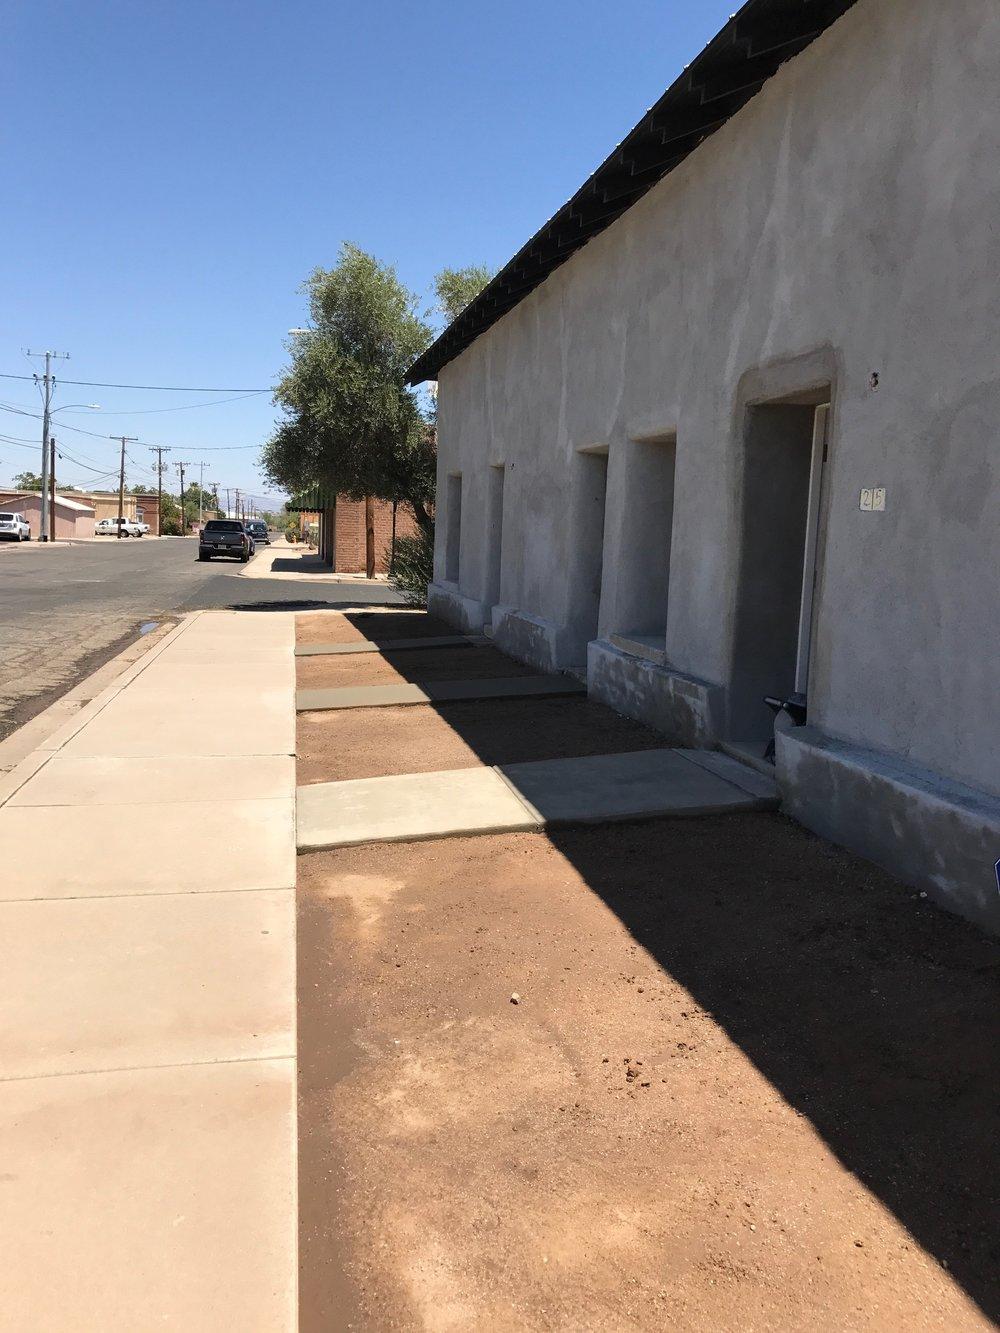 Rowhouse25 - Tremaine Ranch - Air BNB Rental - Phoenix, Arizona24.JPG